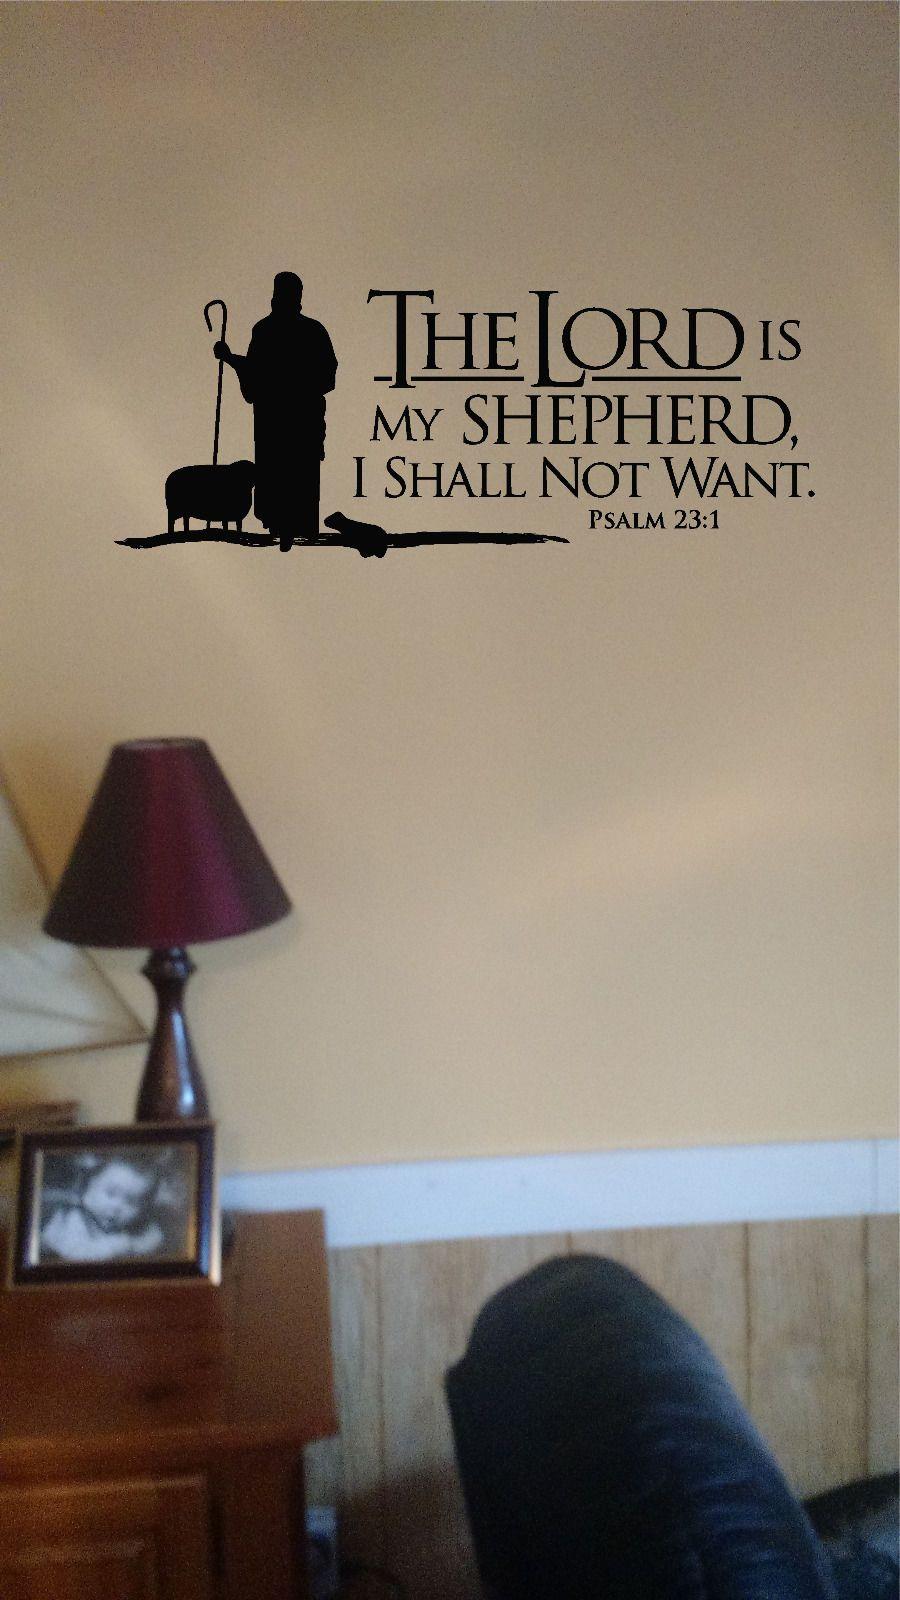 Psalm 23 Bible Verse Quote The Lord Is My Shepherd Vinyl Wall Art Sticker Decal Mural With 3d Butterflies Home Church School Decor Vinyl Wall Art Wall Psalm 23